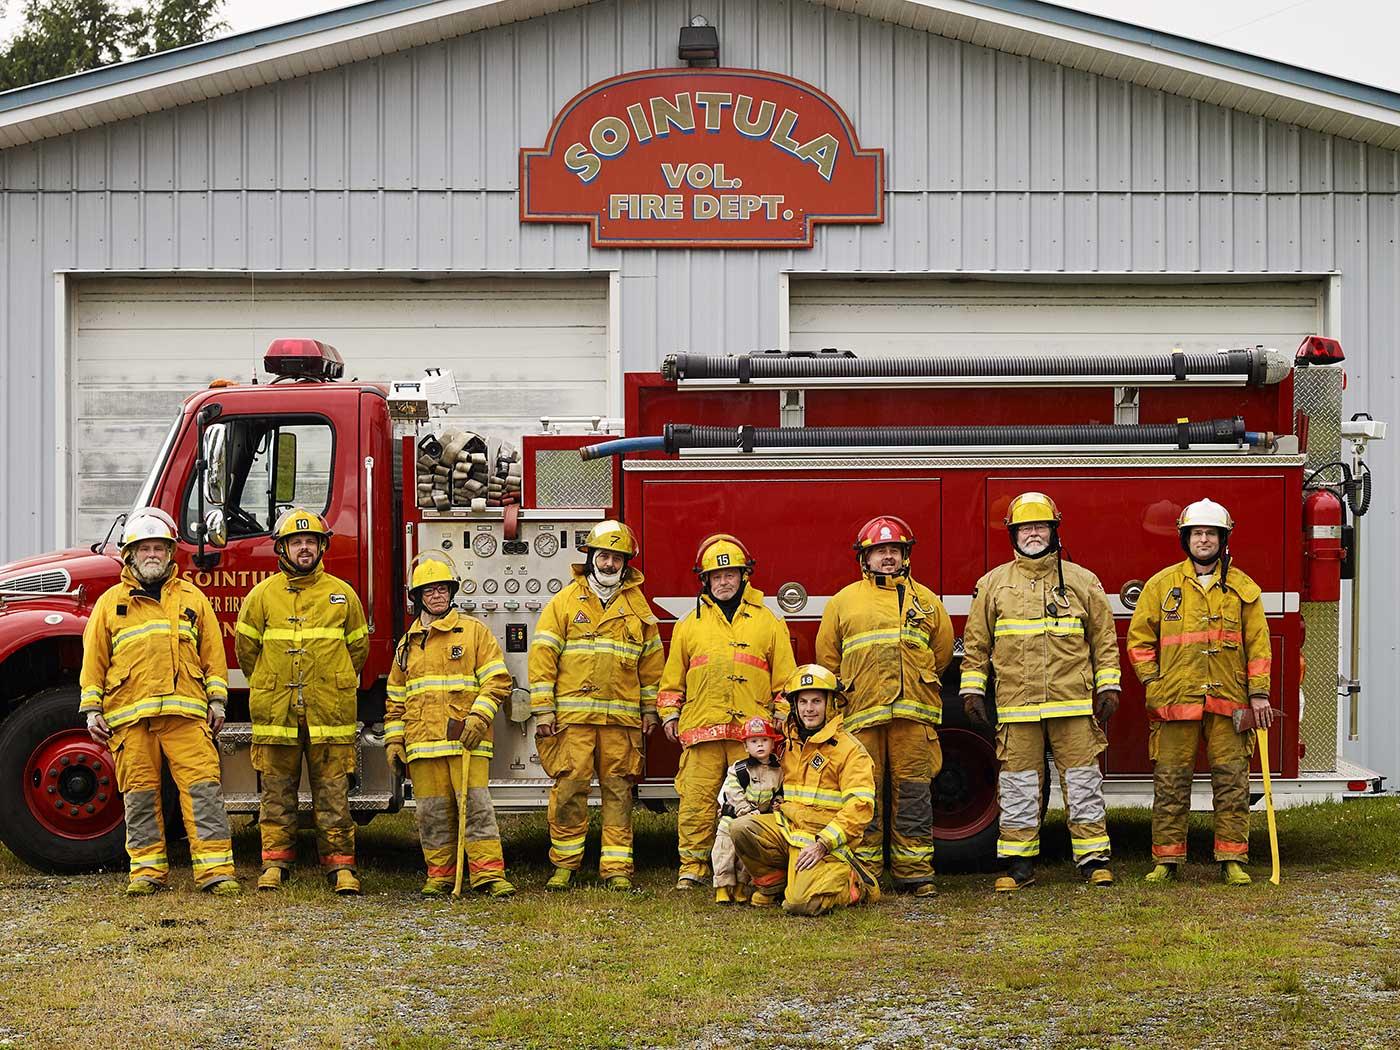 Sointula Volunteer Fire Department.